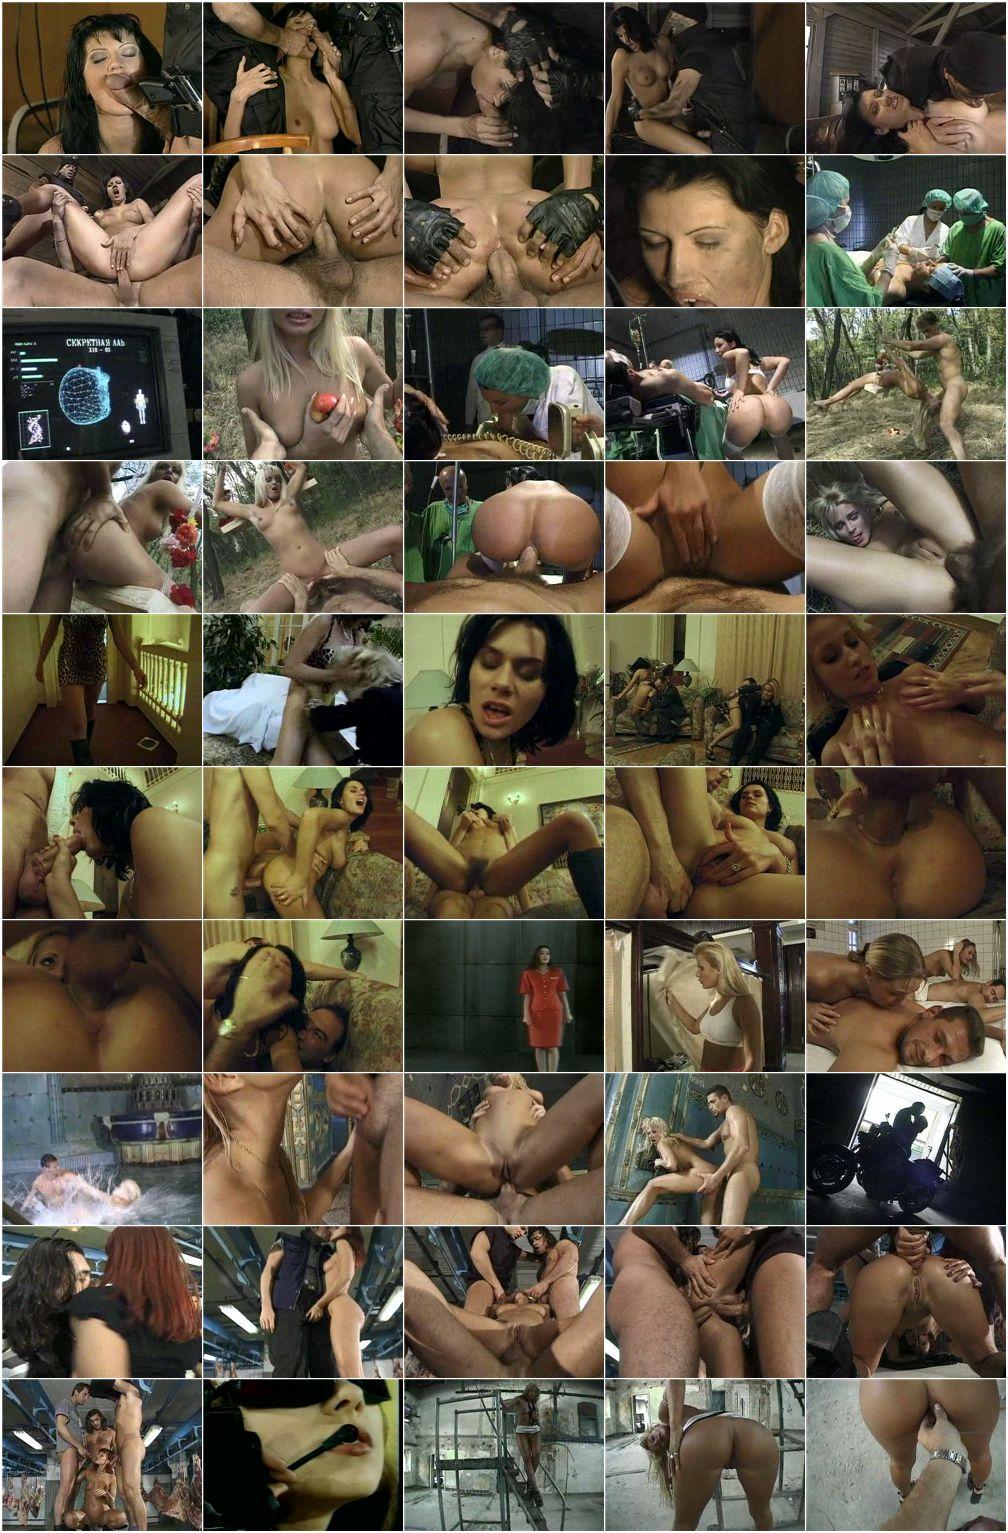 kino-s-rokko-porno